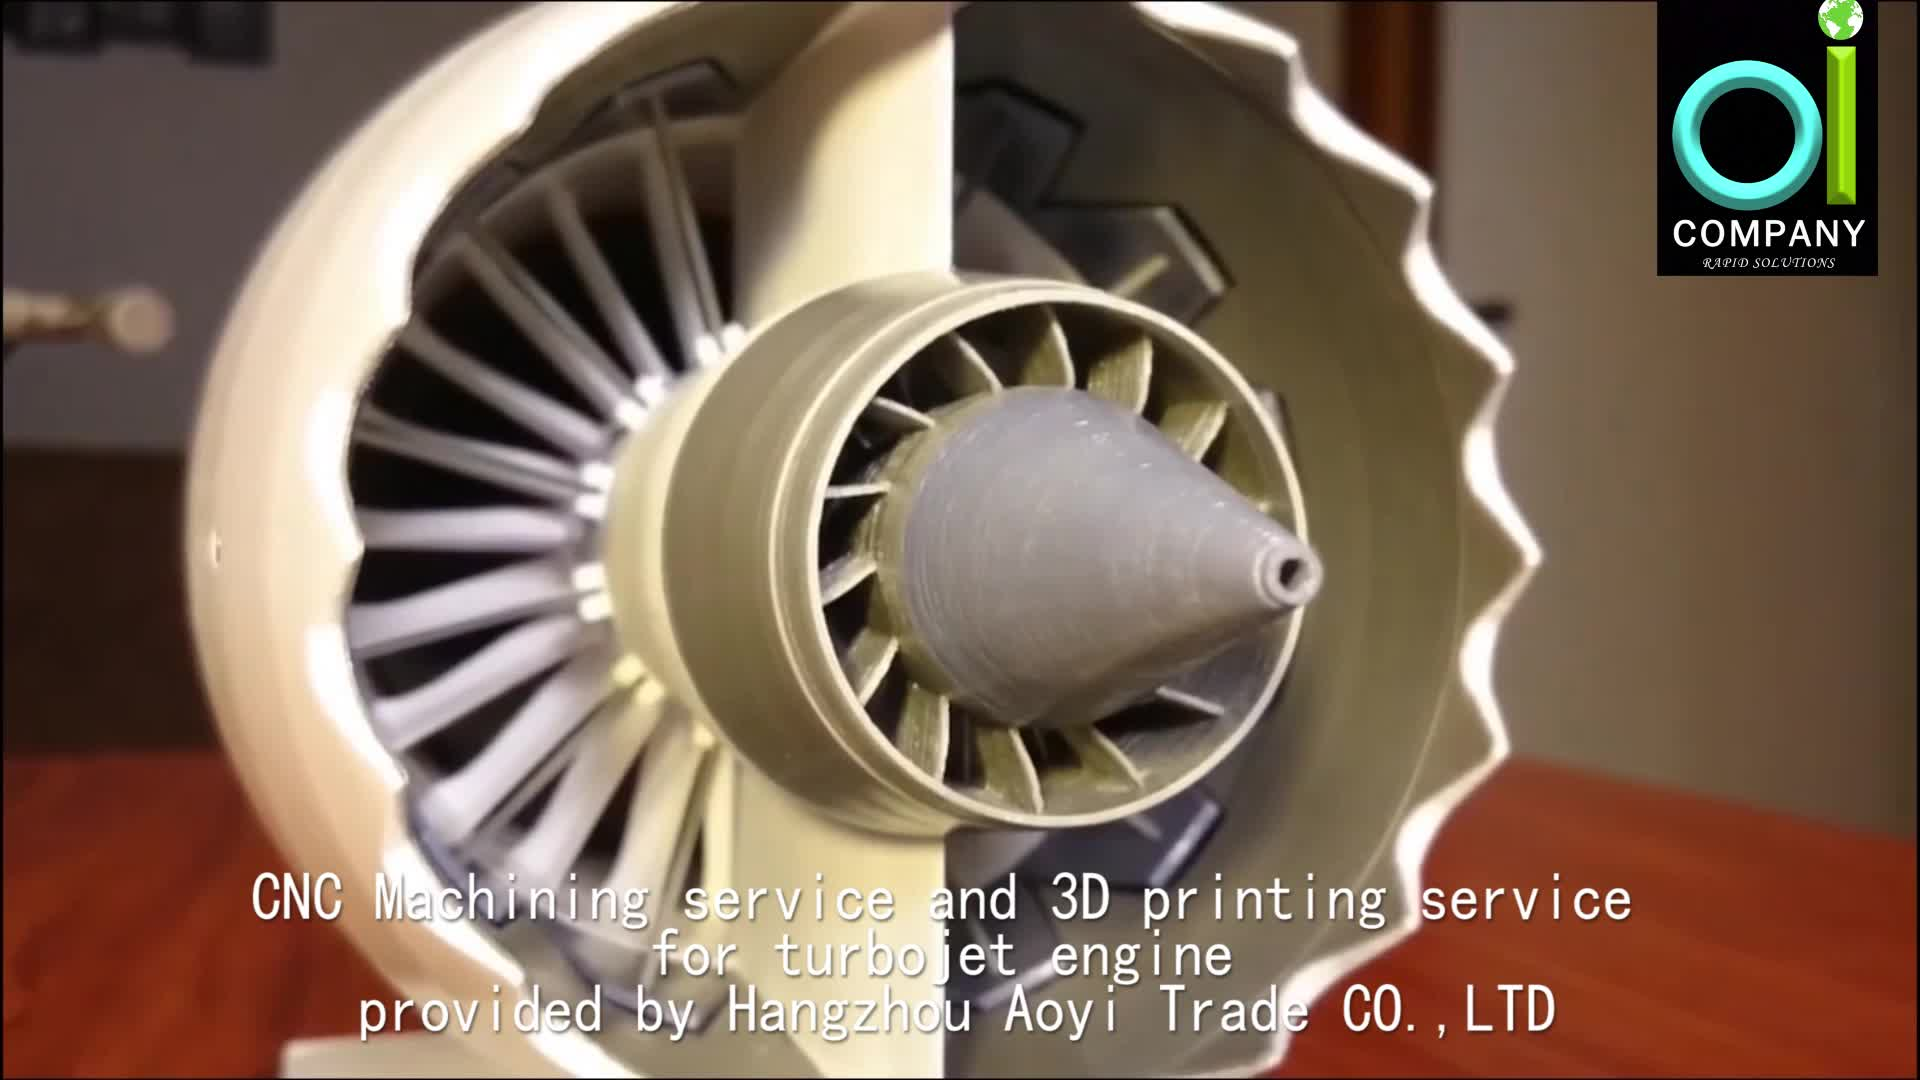 CNC Machining service and 3d printing service Custom Made OEM High Precision Aircraft Engine Turbojet part